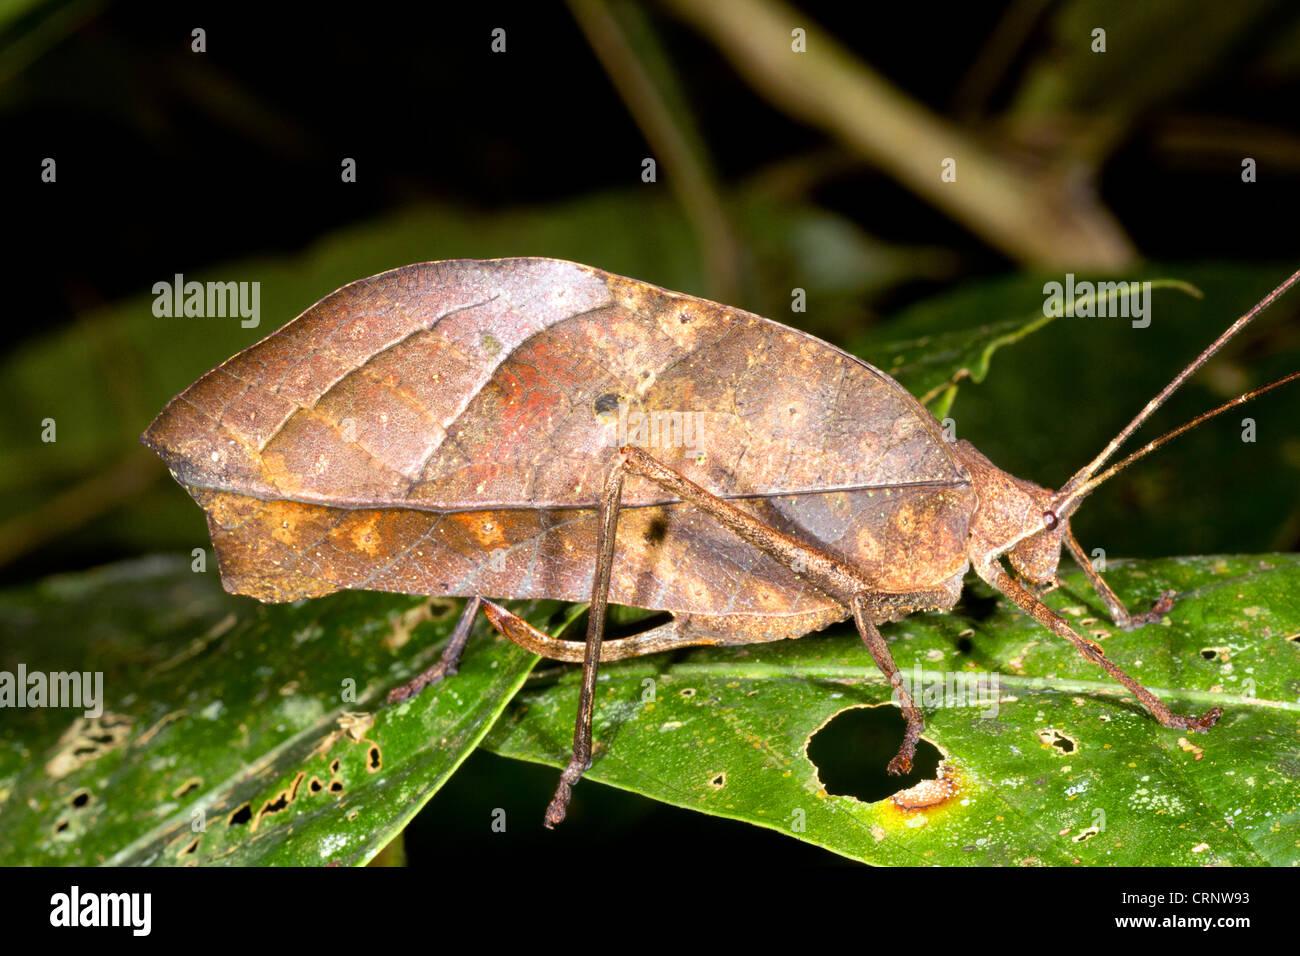 Leaf Mimic Katydid in rainforest, Ecuador - Stock Image